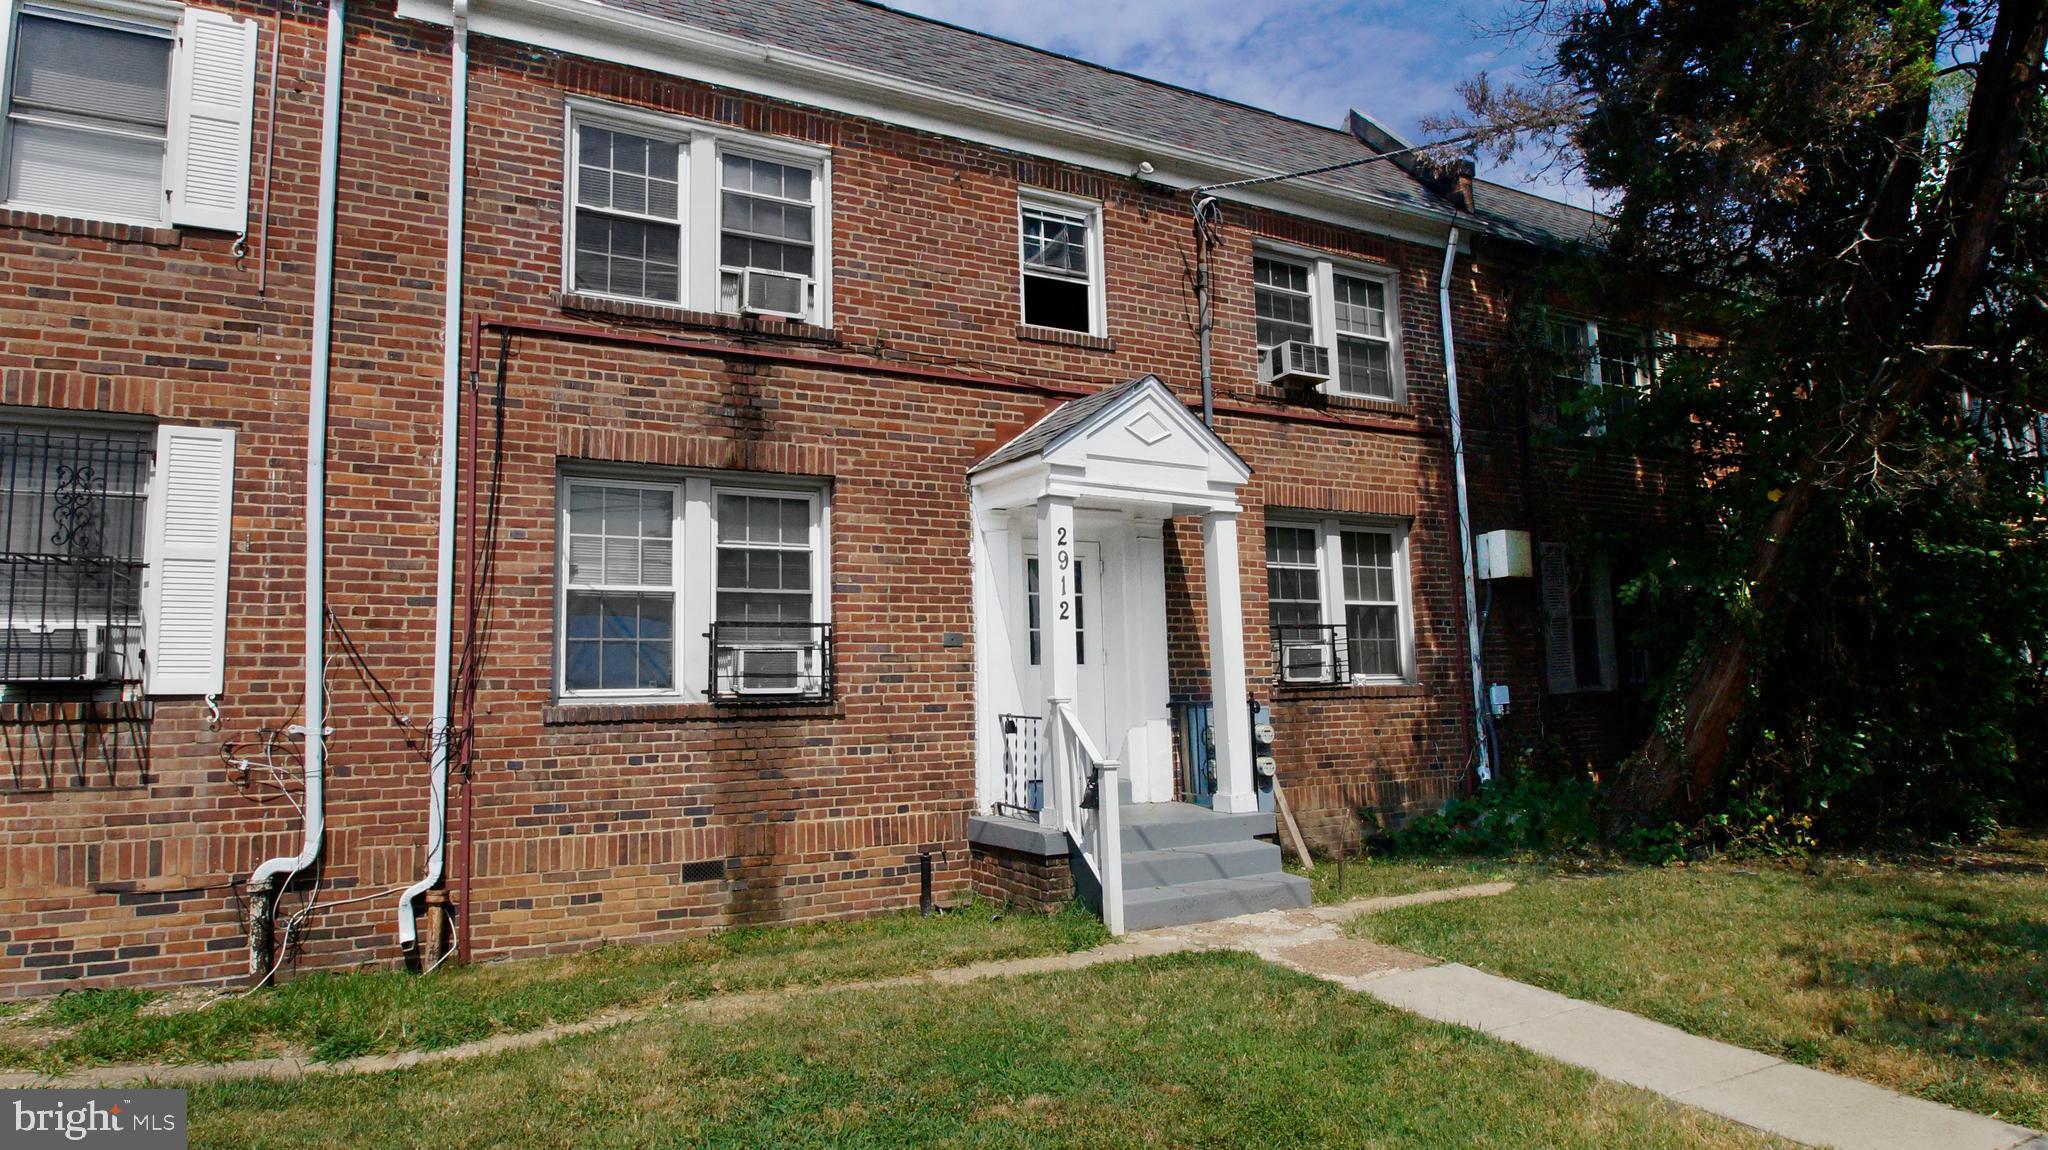 2912 8TH STREET NE, WASHINGTON, DC 20017